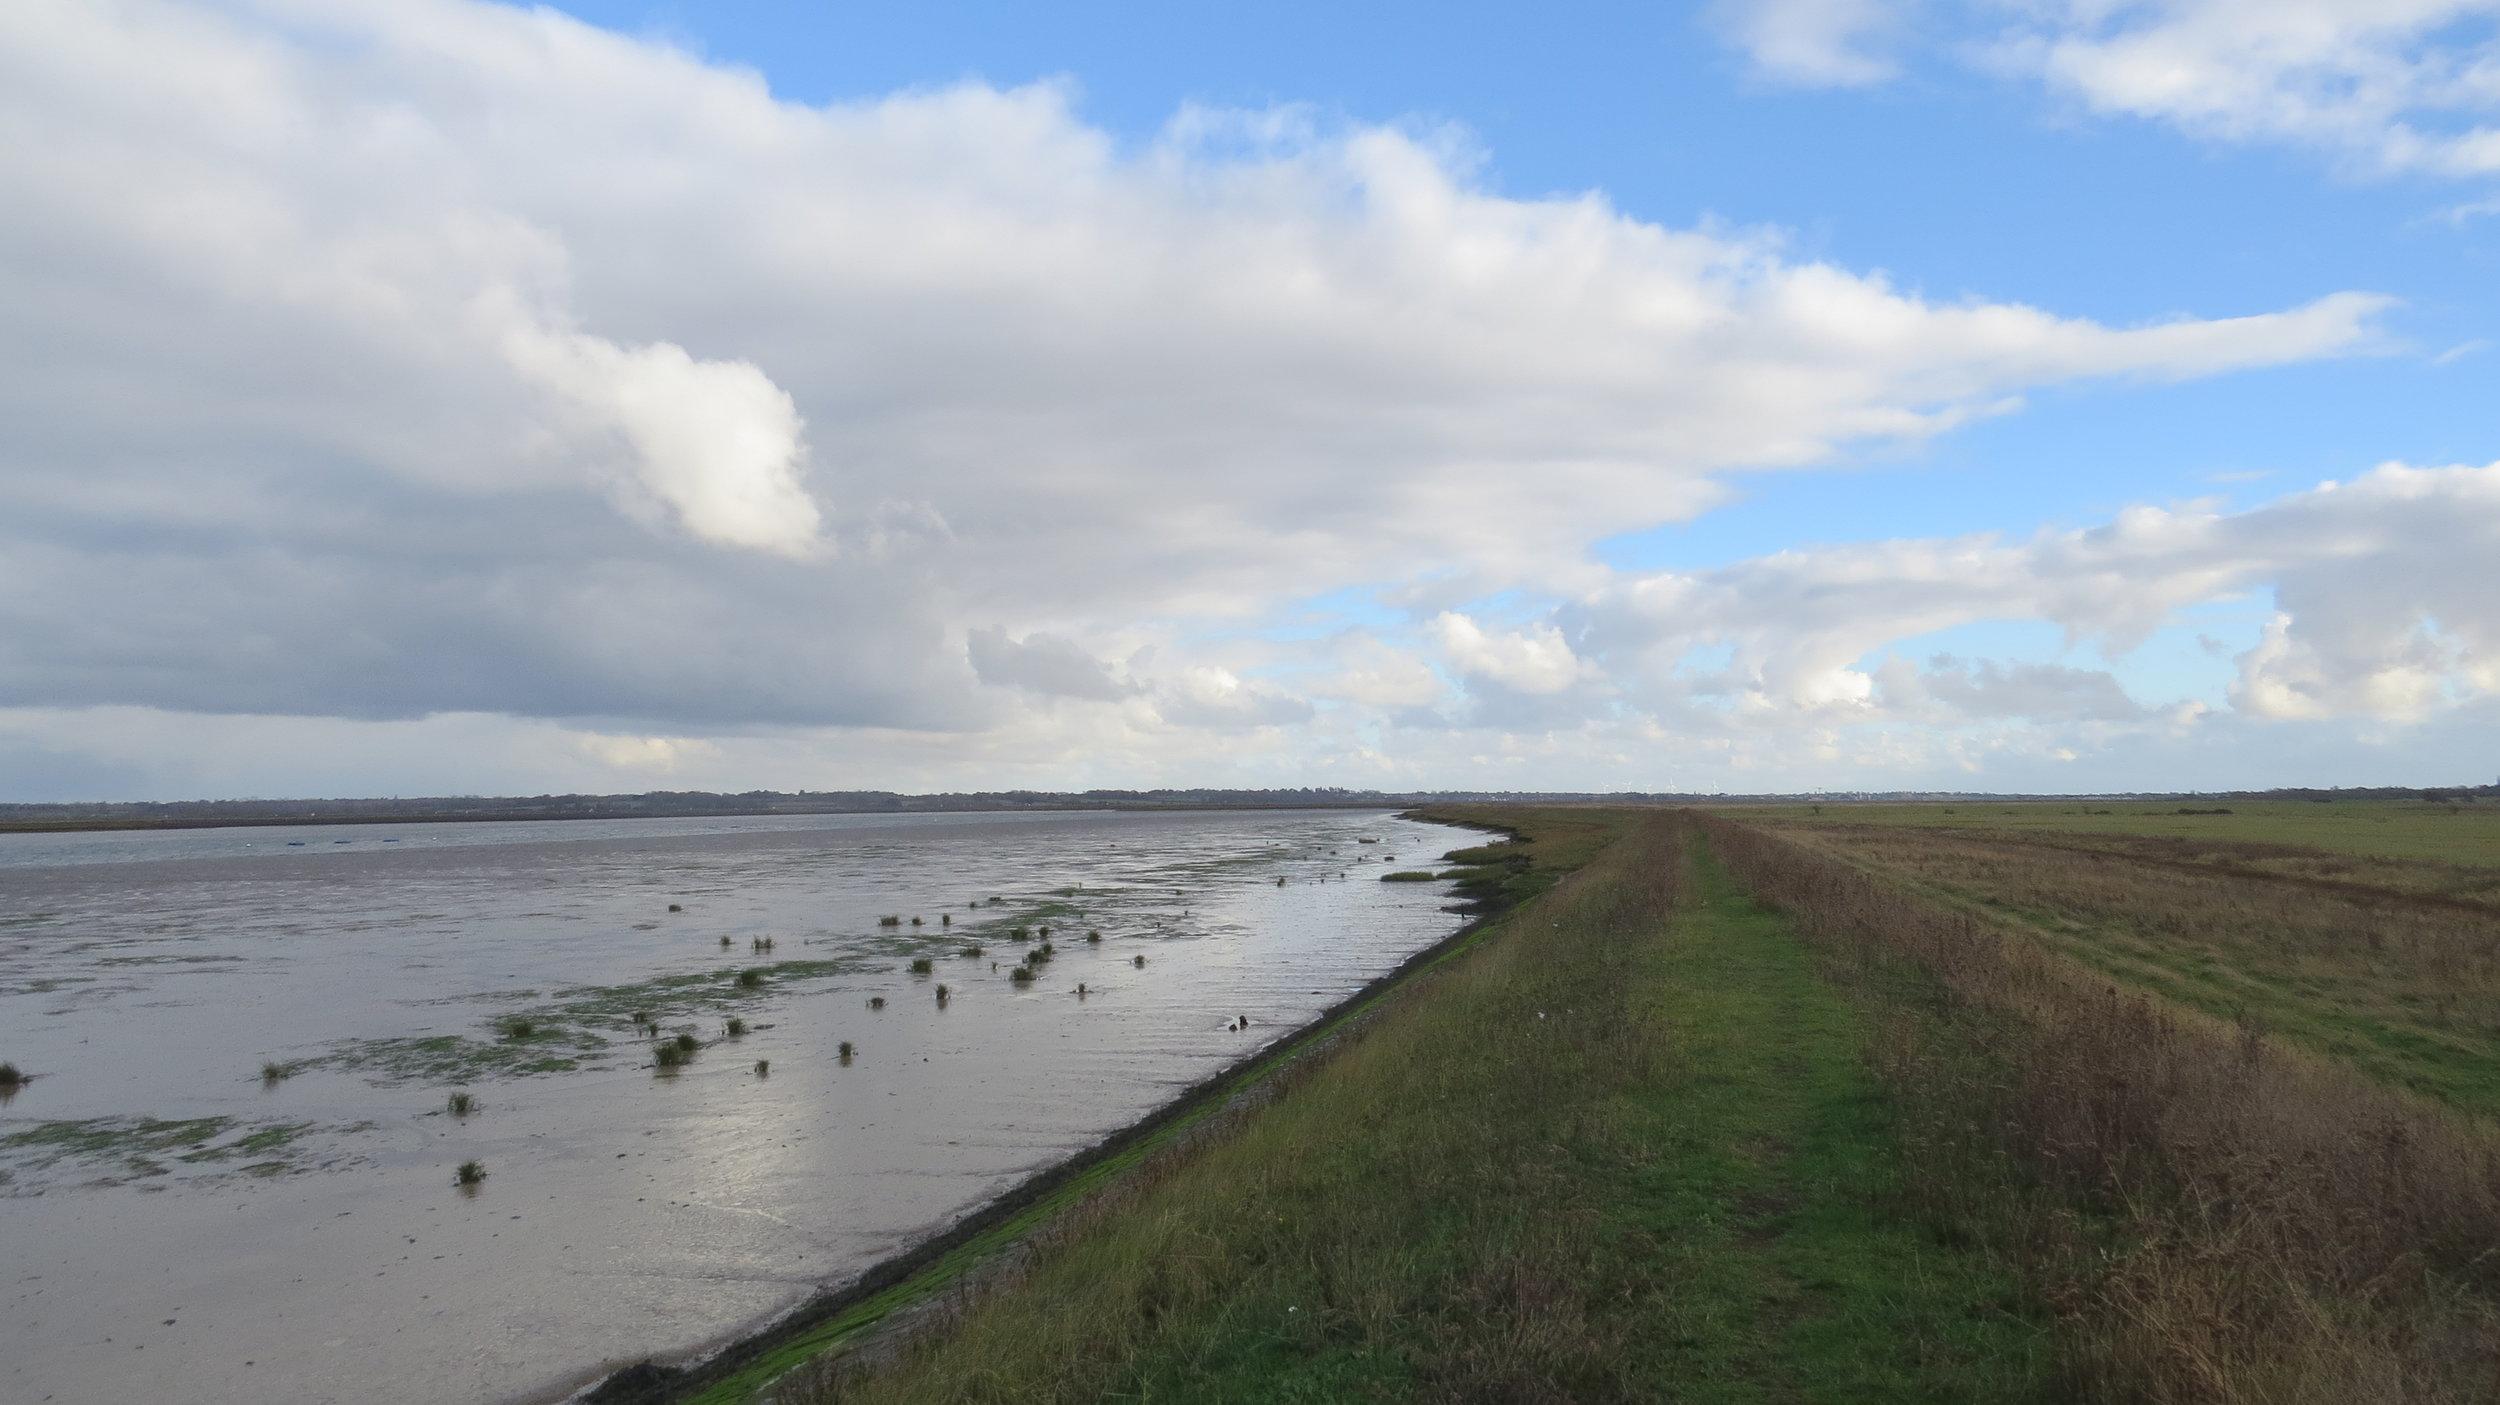 Sea Embankment along North of Mersea